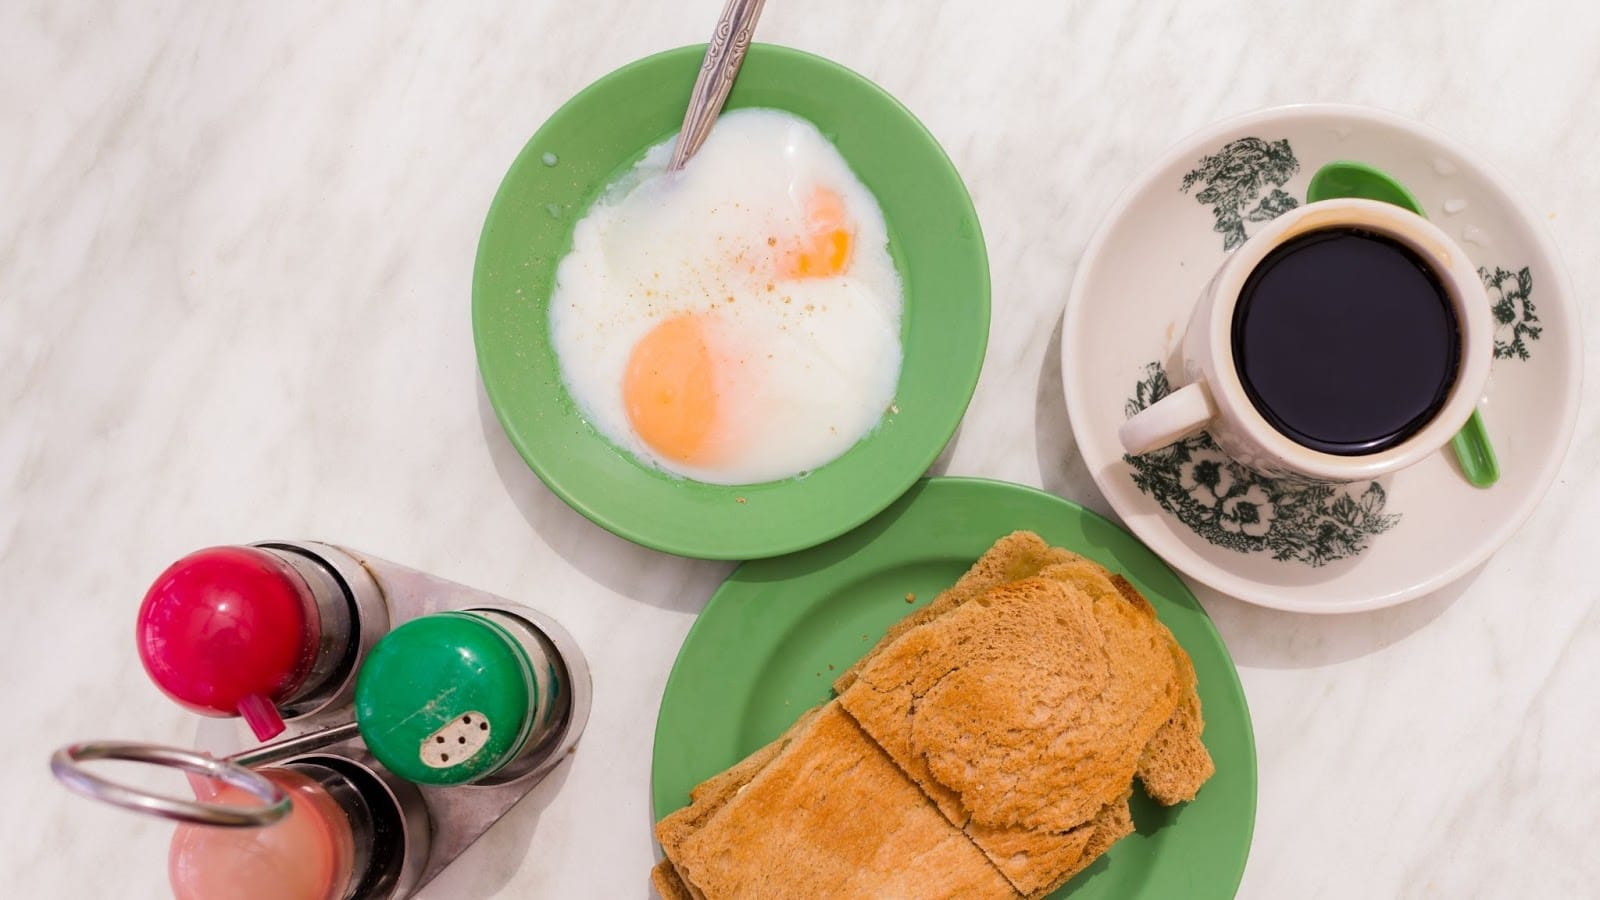 Traditional Singaporean breakfast of kopi, kaya toast and 2 runny eggs